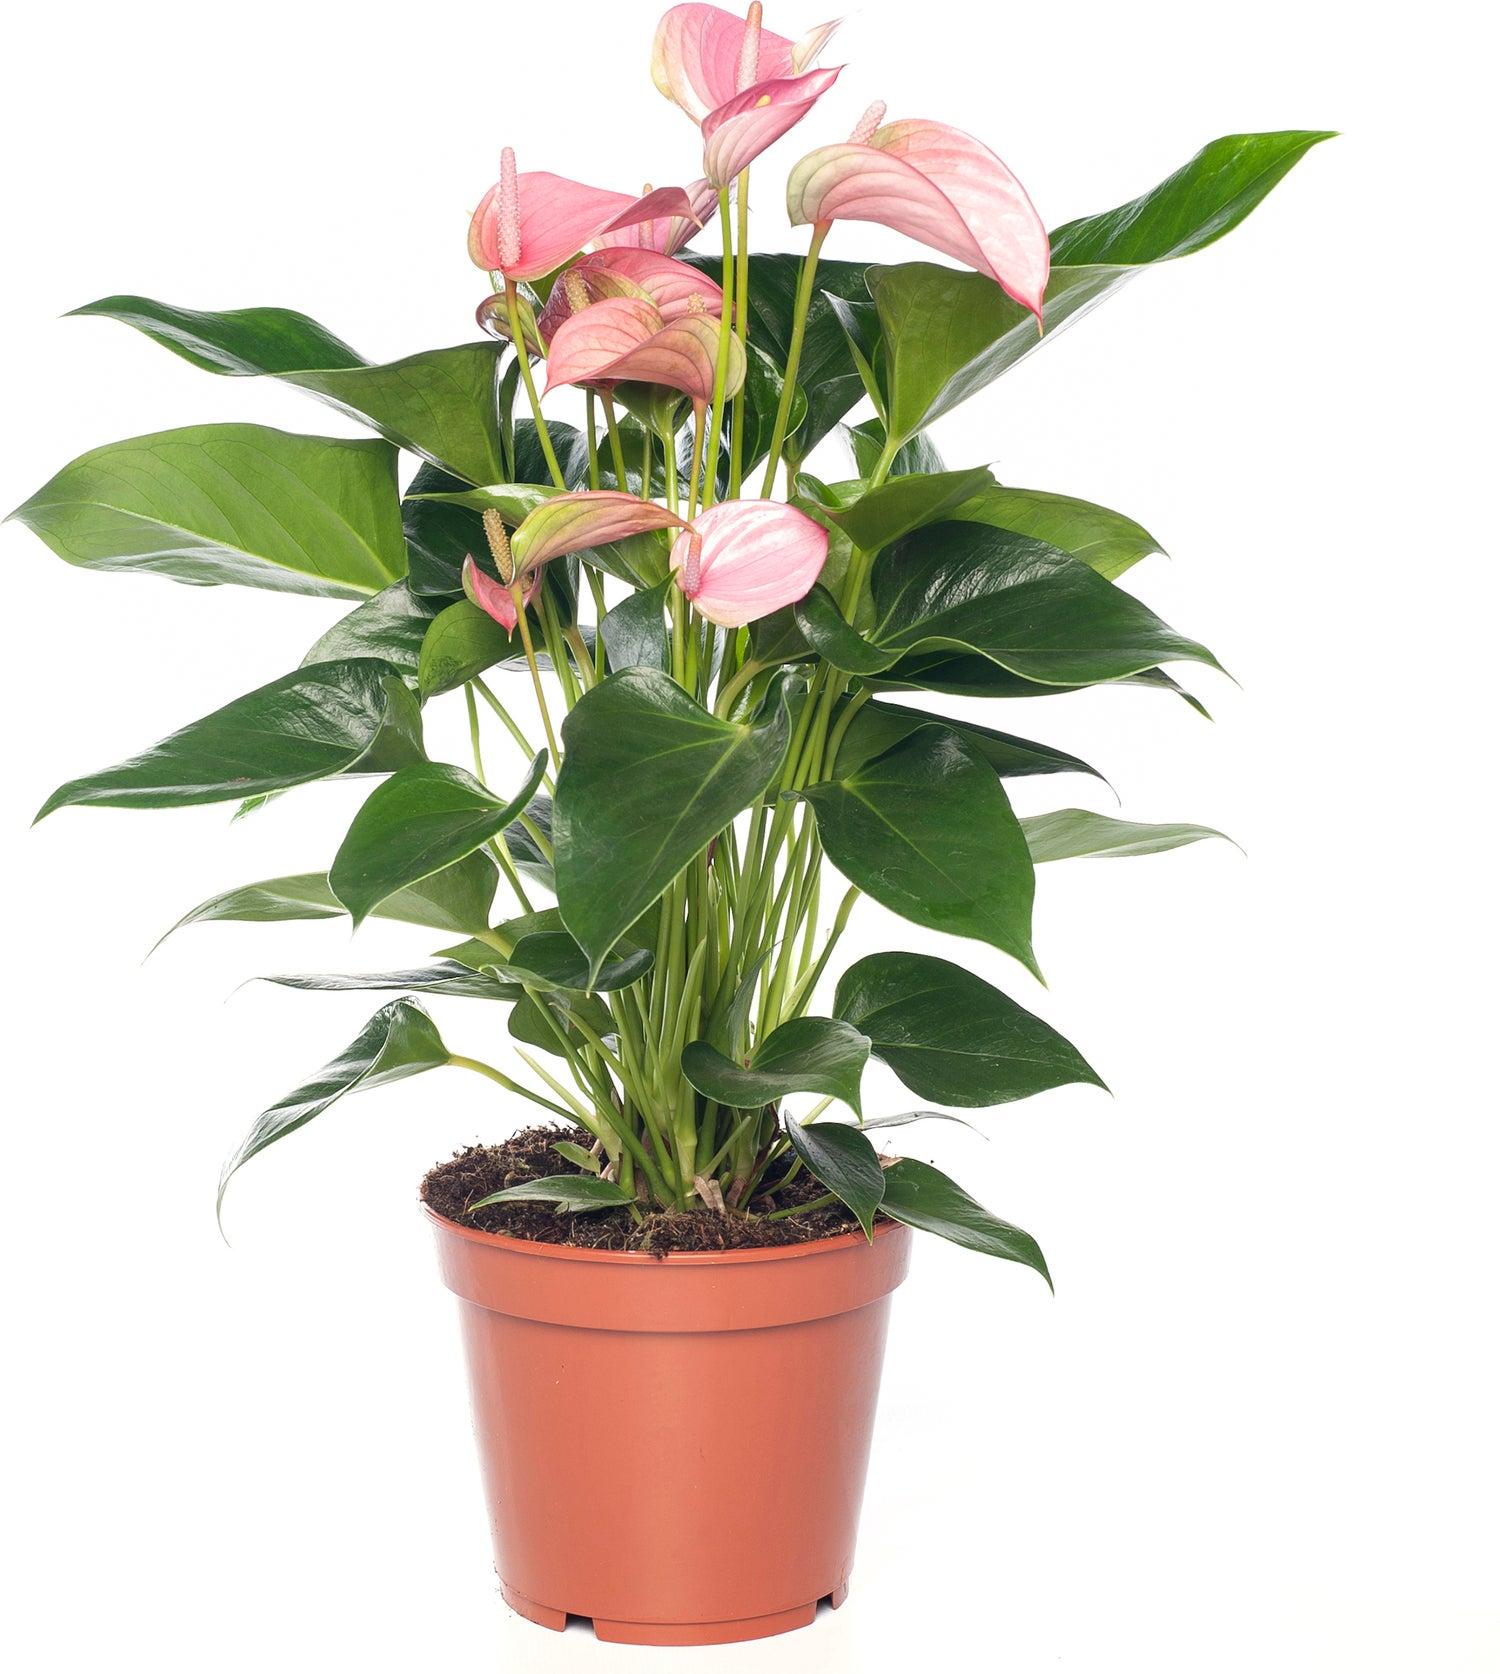 Flamingoplant (Anthurium andreanum 'Pink Jolie') D 12 H 40 cm